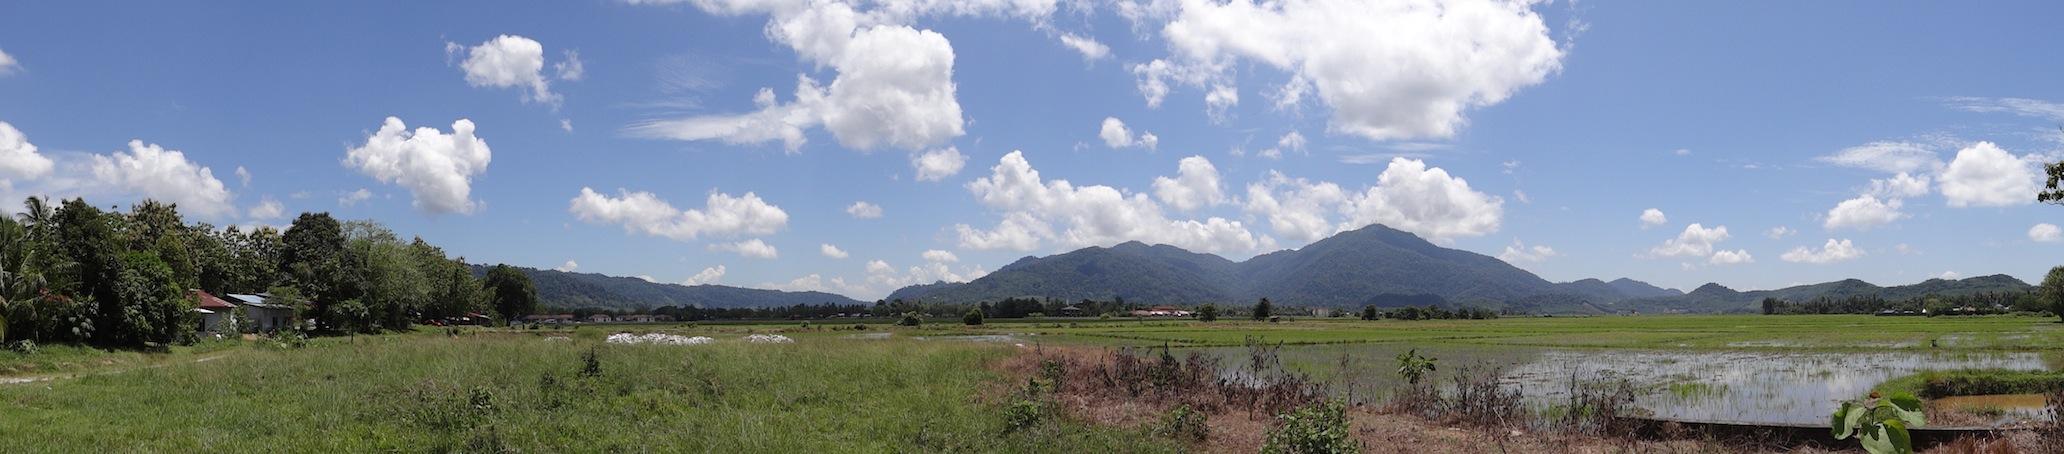 77 Langawi island panorama